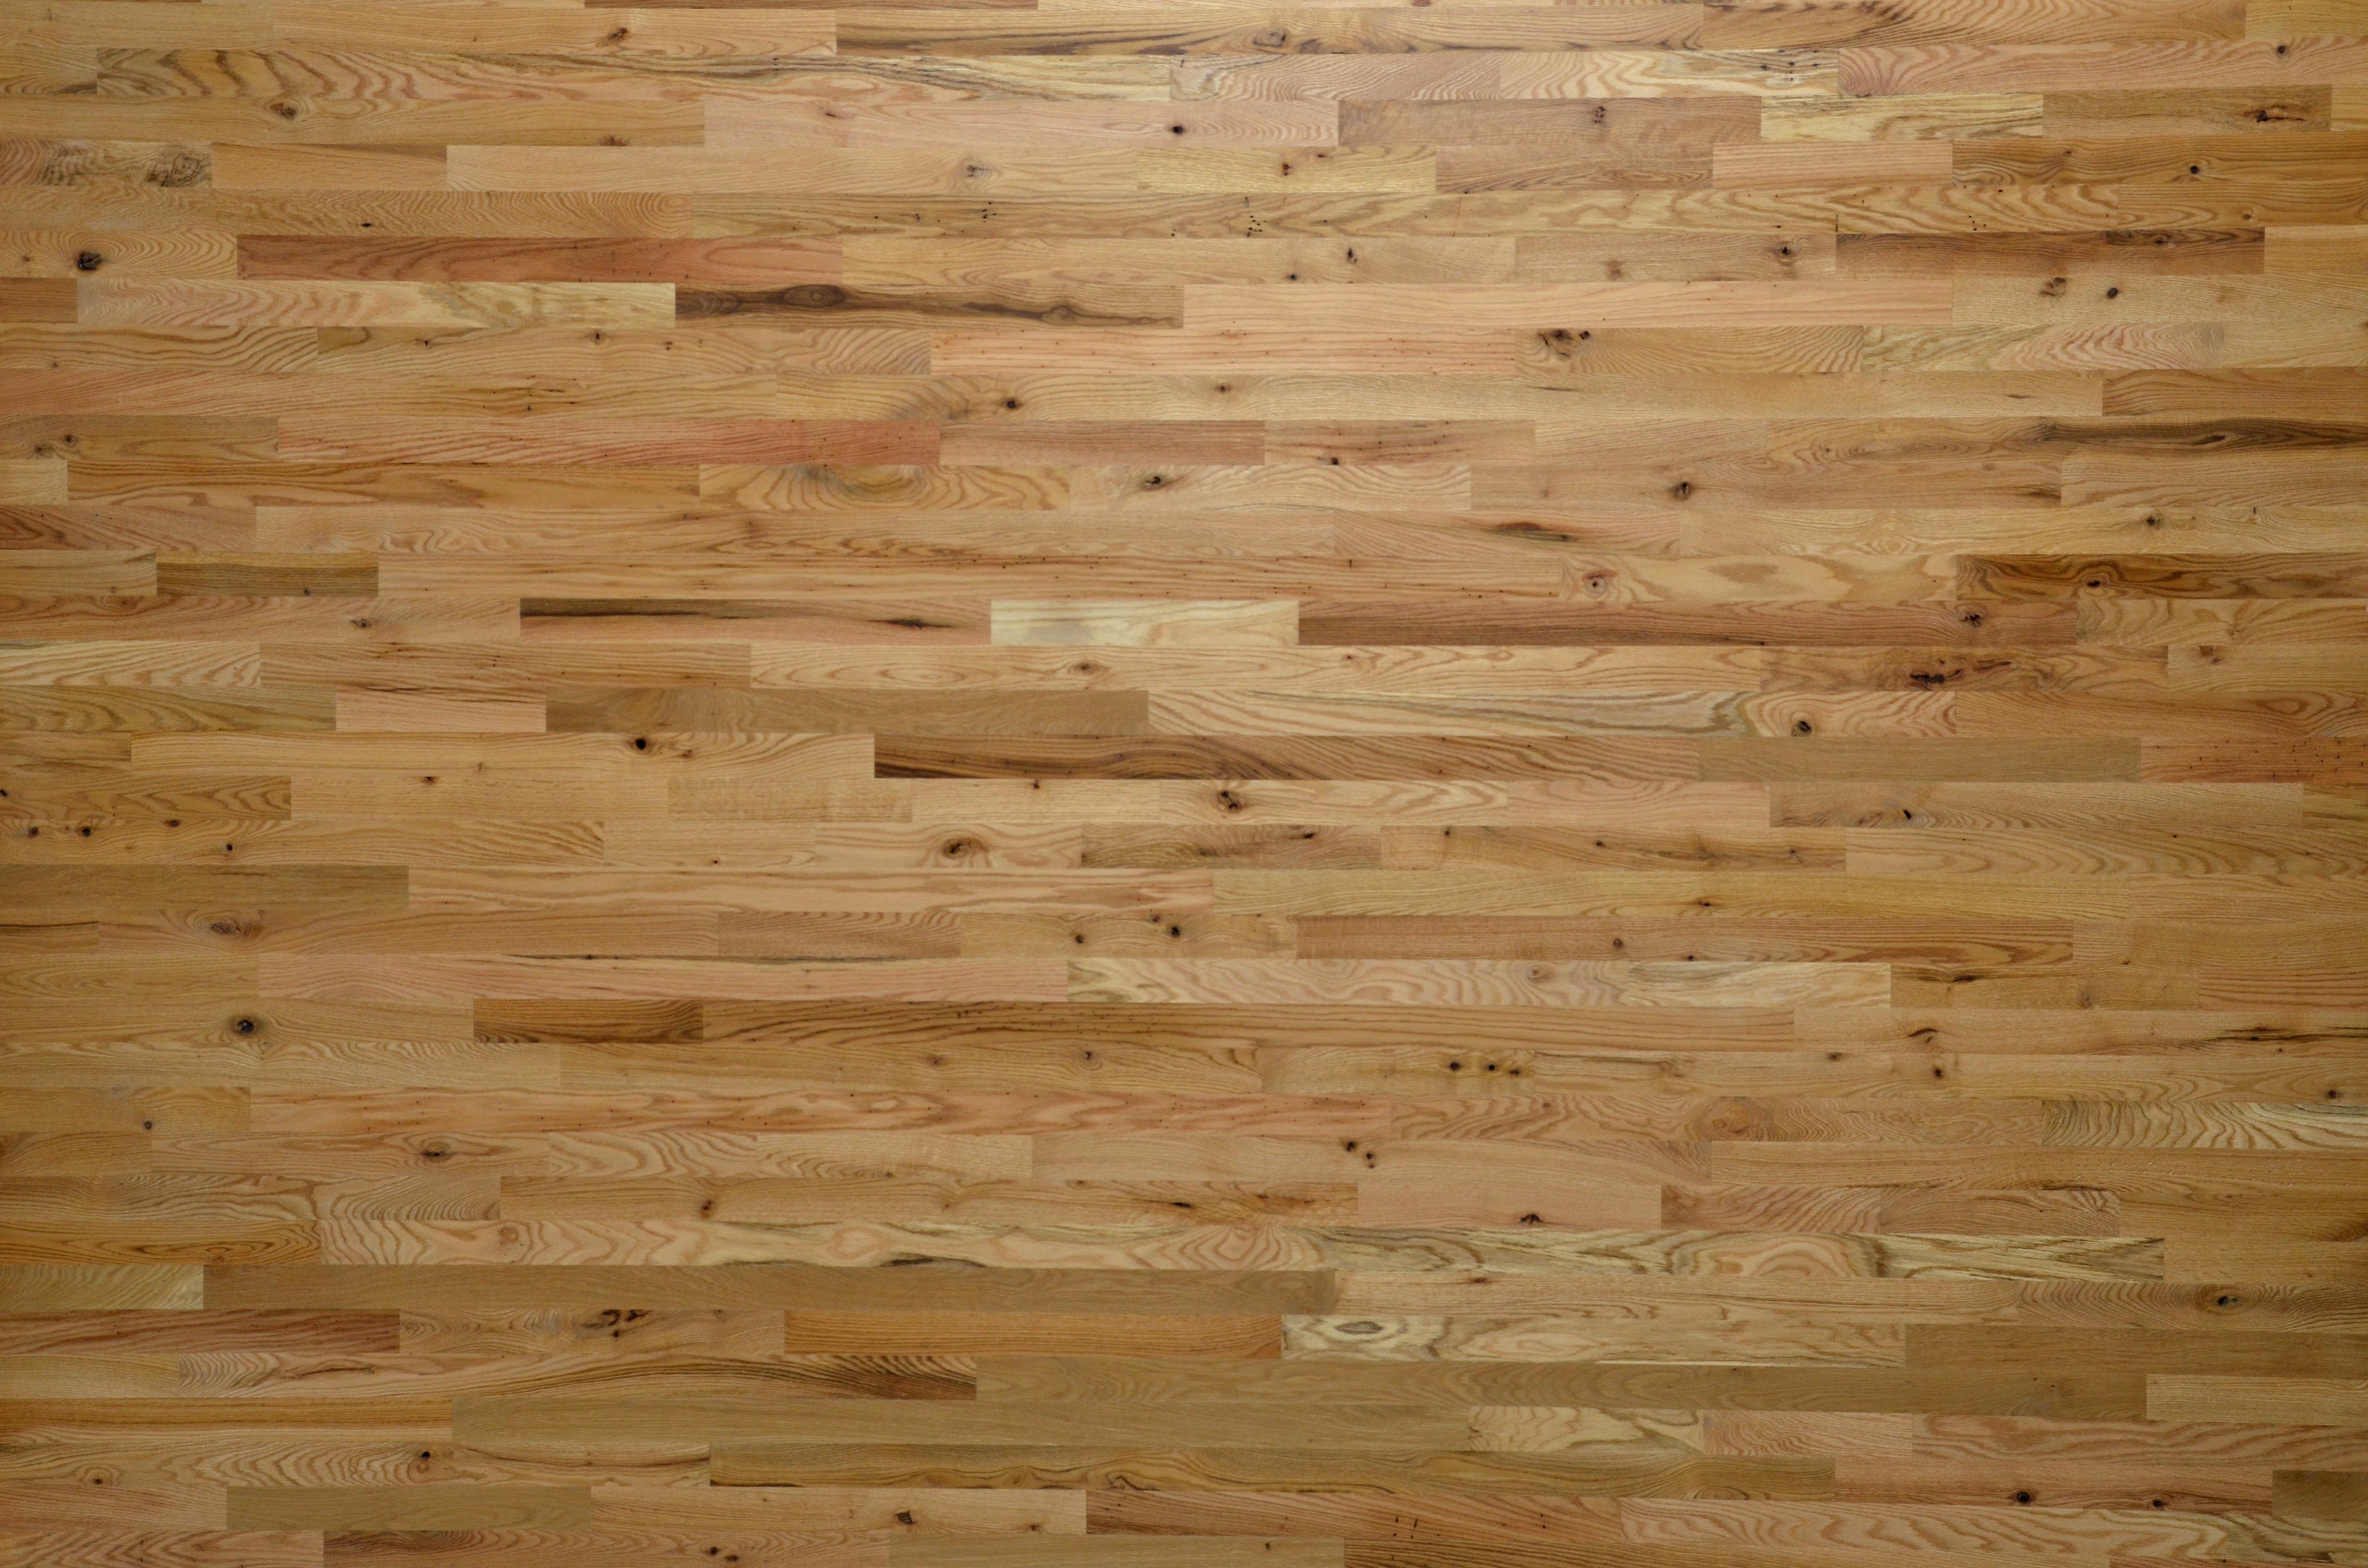 hardwood flooring sales jobs of lacrosse hardwood flooring walnut white oak red oak hickory with 2 common red oak